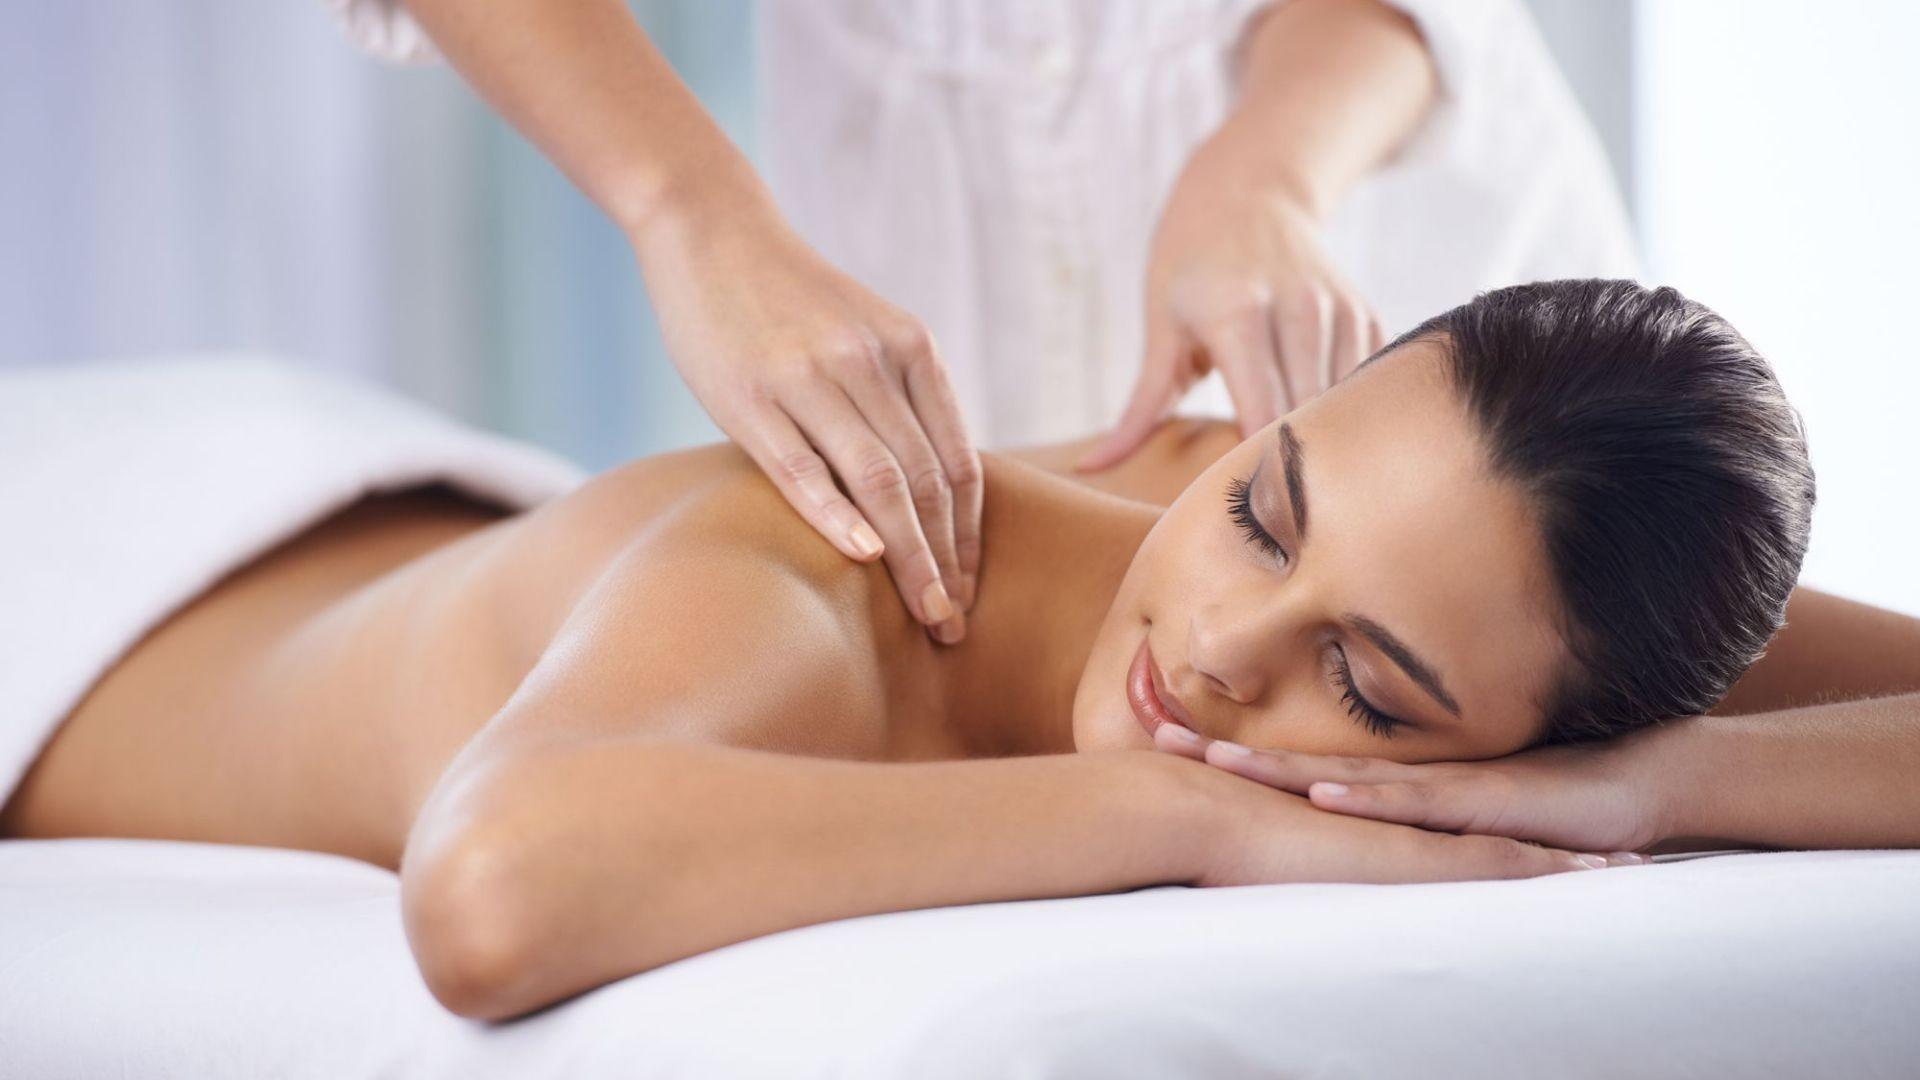 000 masaje relax relajacion balneario fisioterapia  (1)